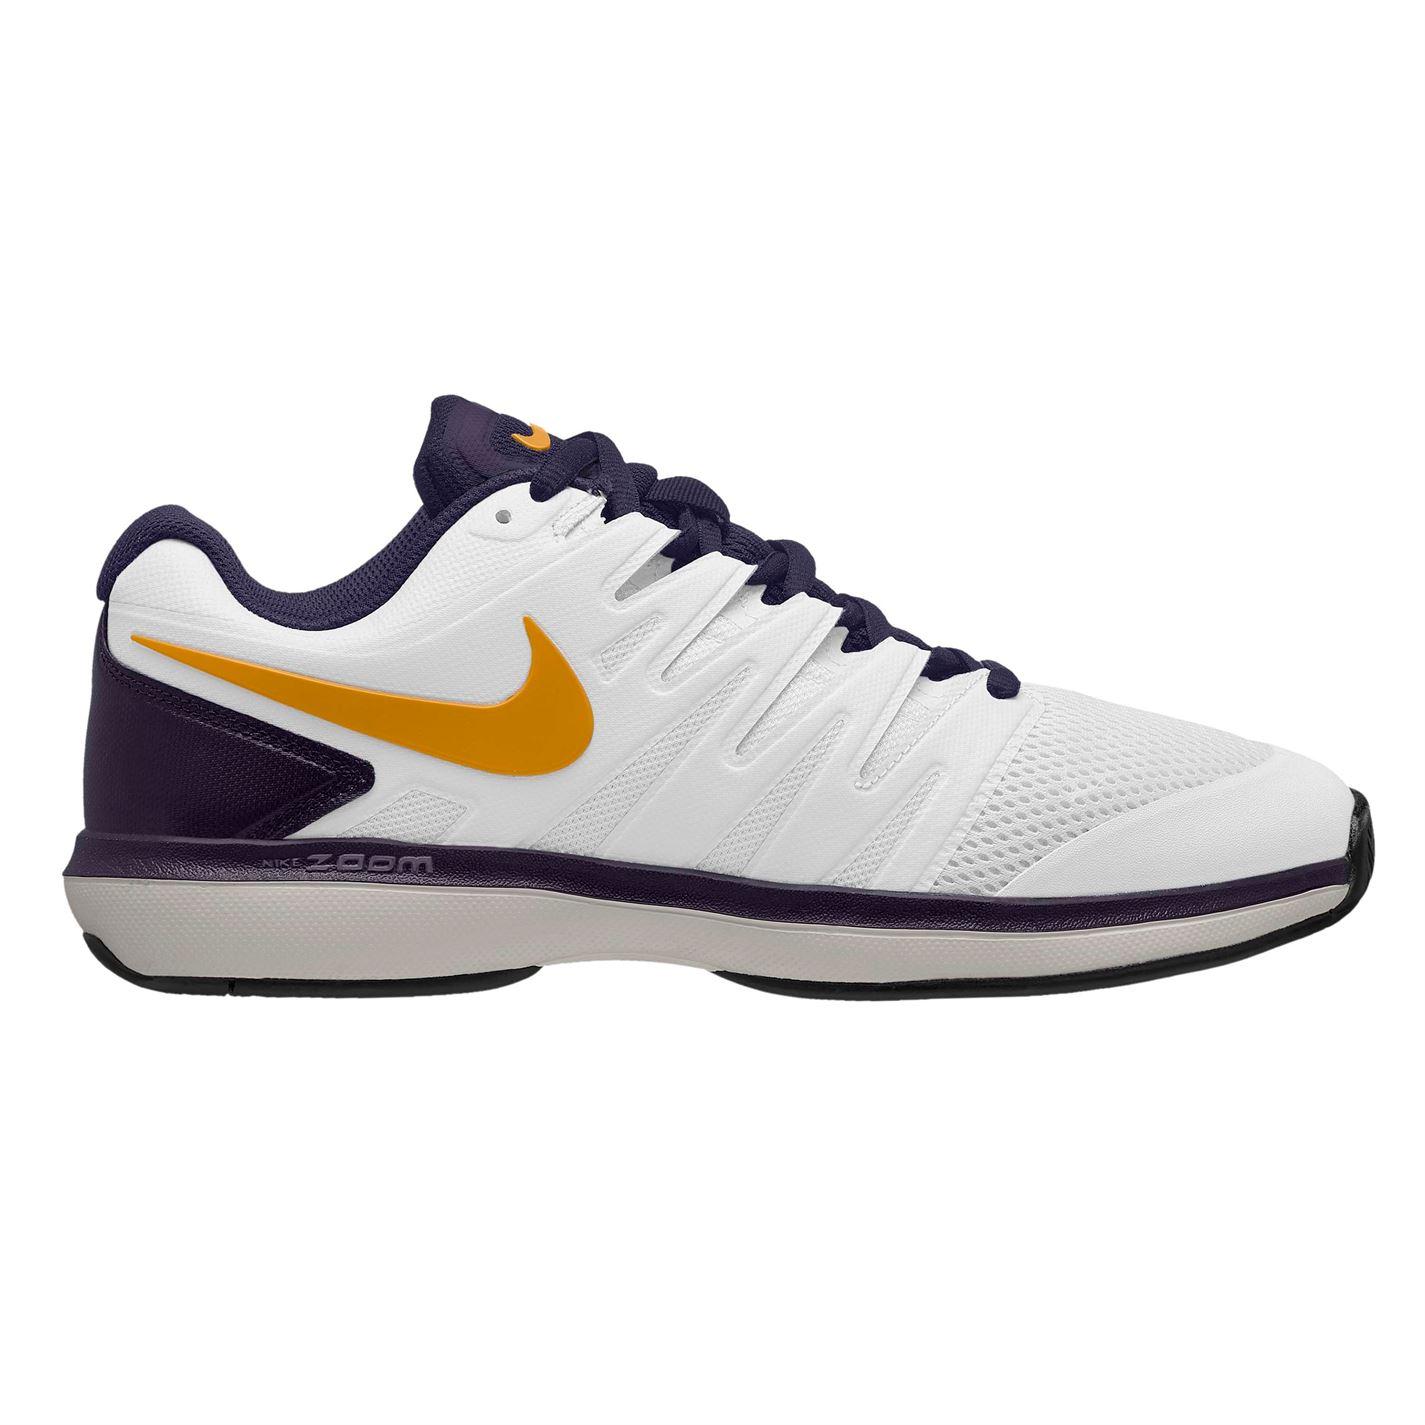 Tenisky Nike Air Zoom Prestige Mens Tennis Shoes - Glami.sk 1df810e1226